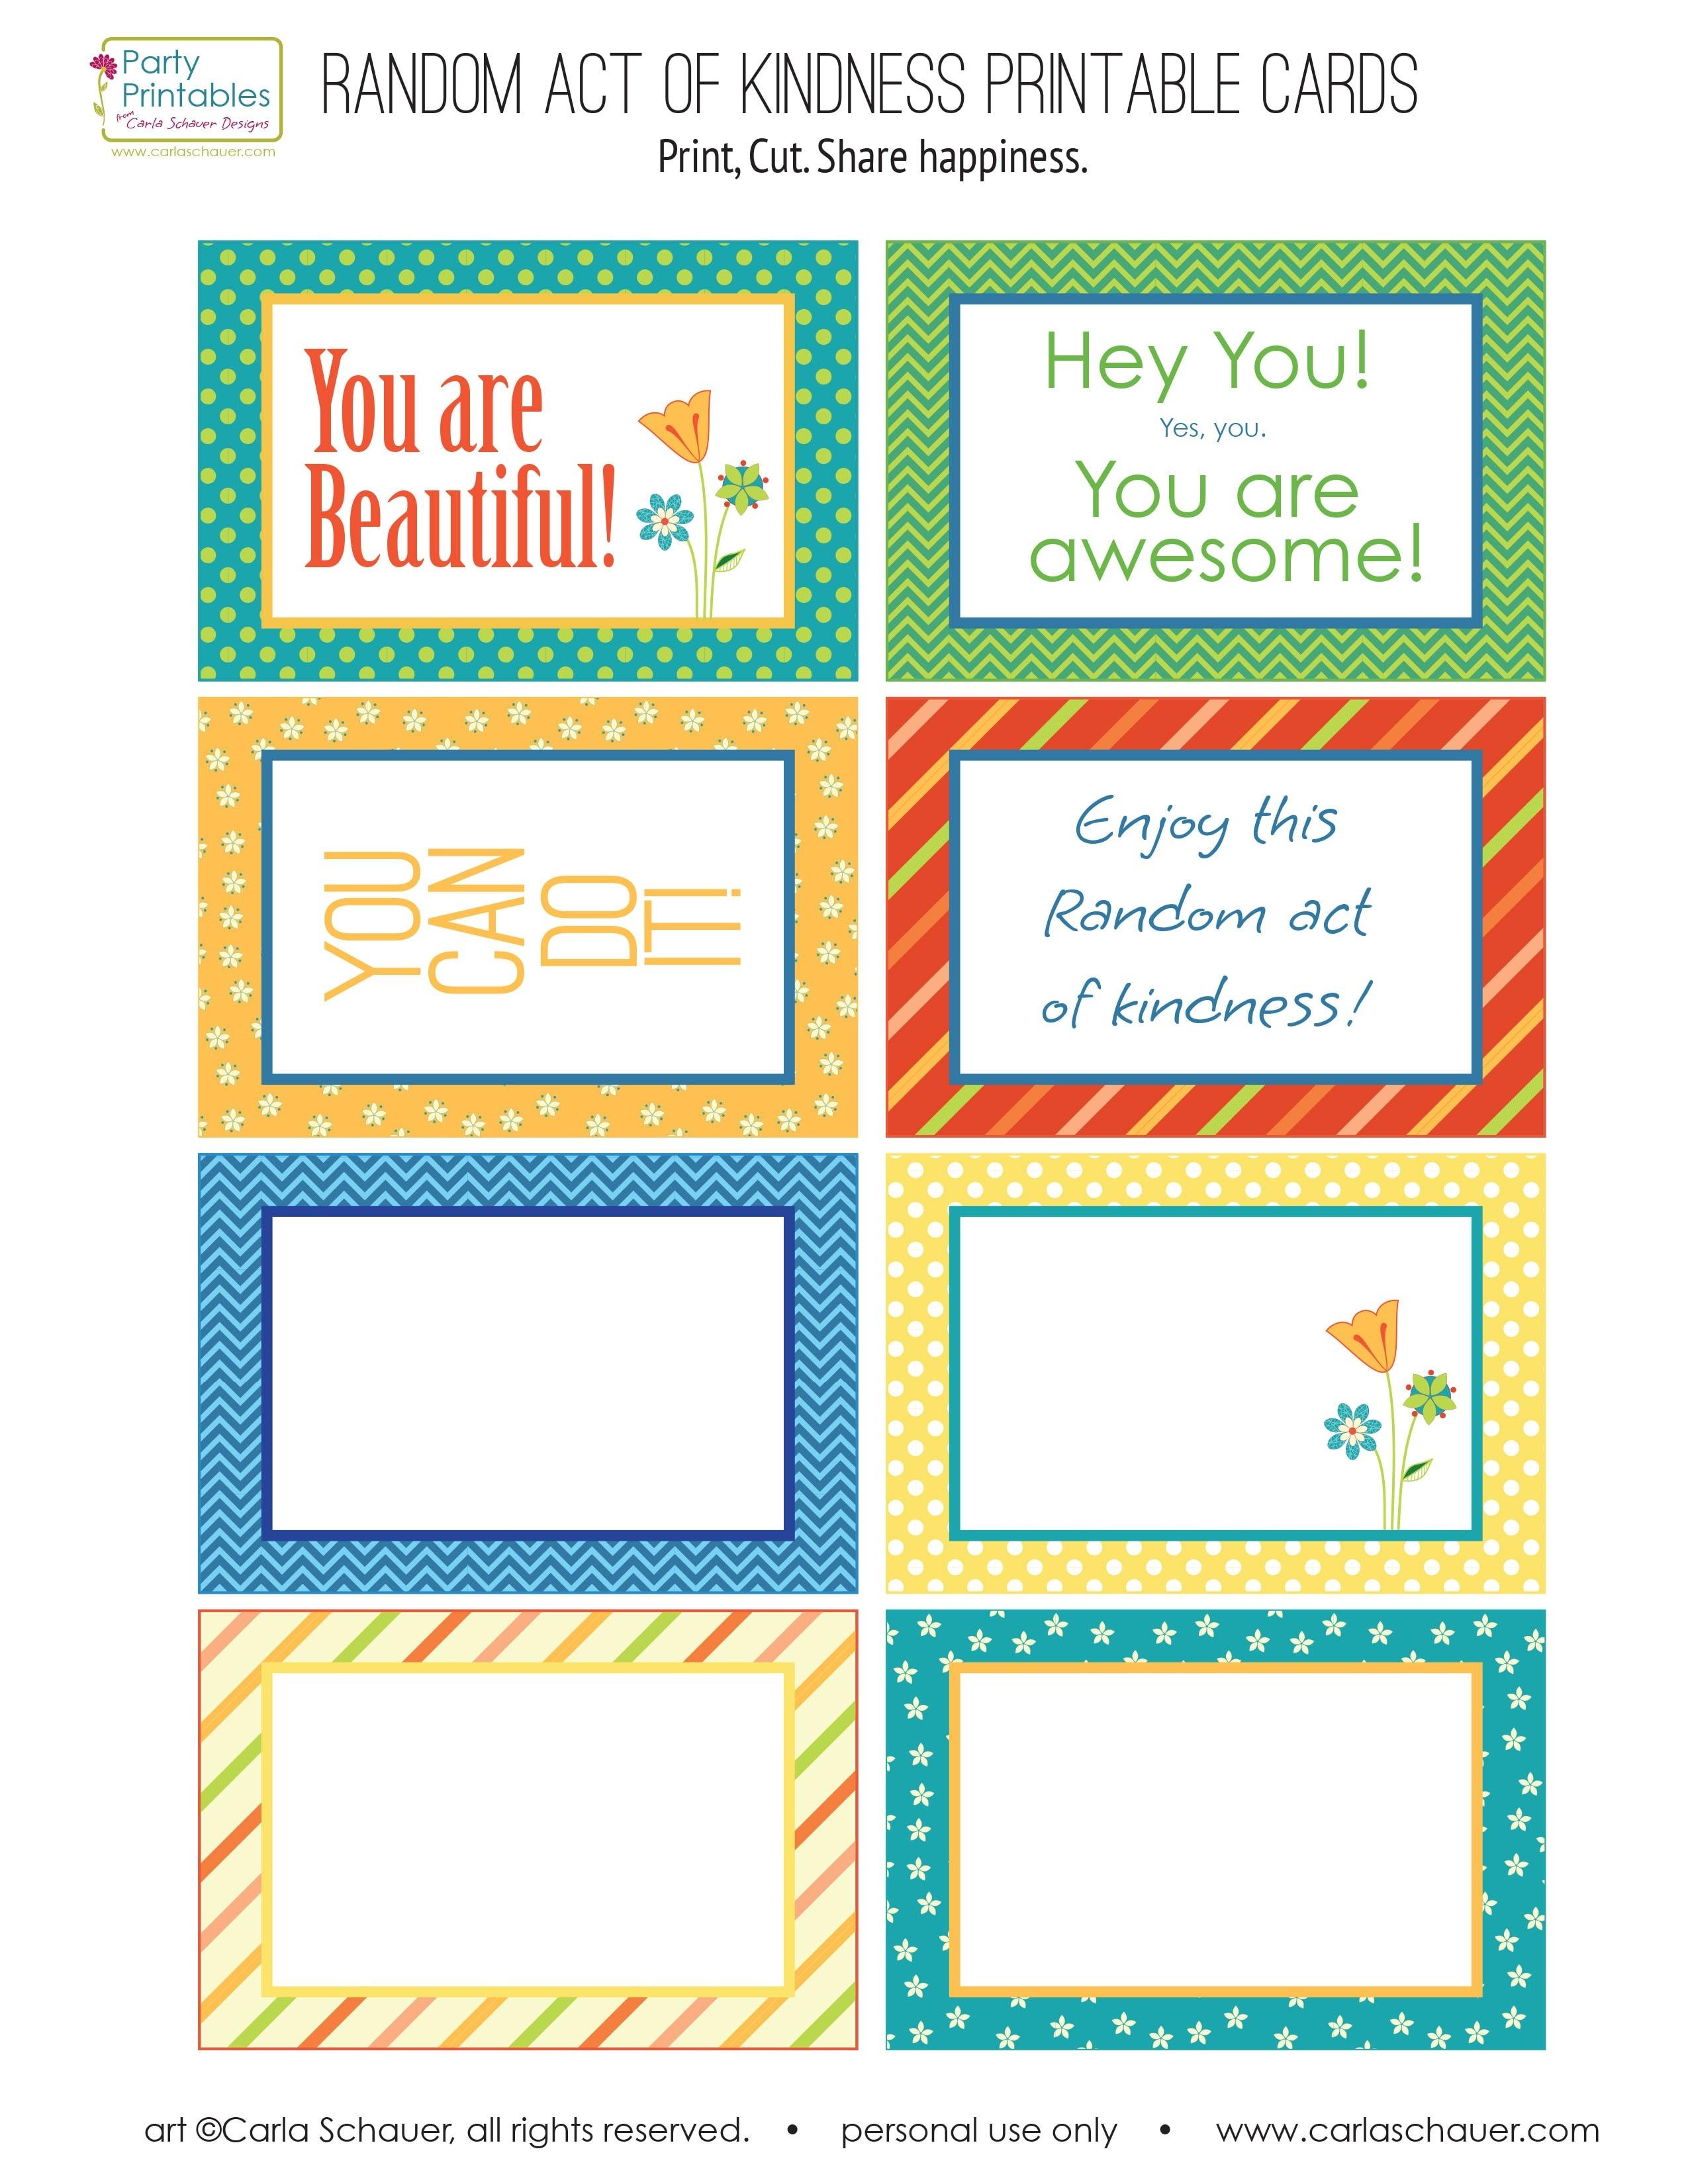 Random Act Of Kindness Free Printables | Carla Schauer Designs - Free Printable Kindness Cards